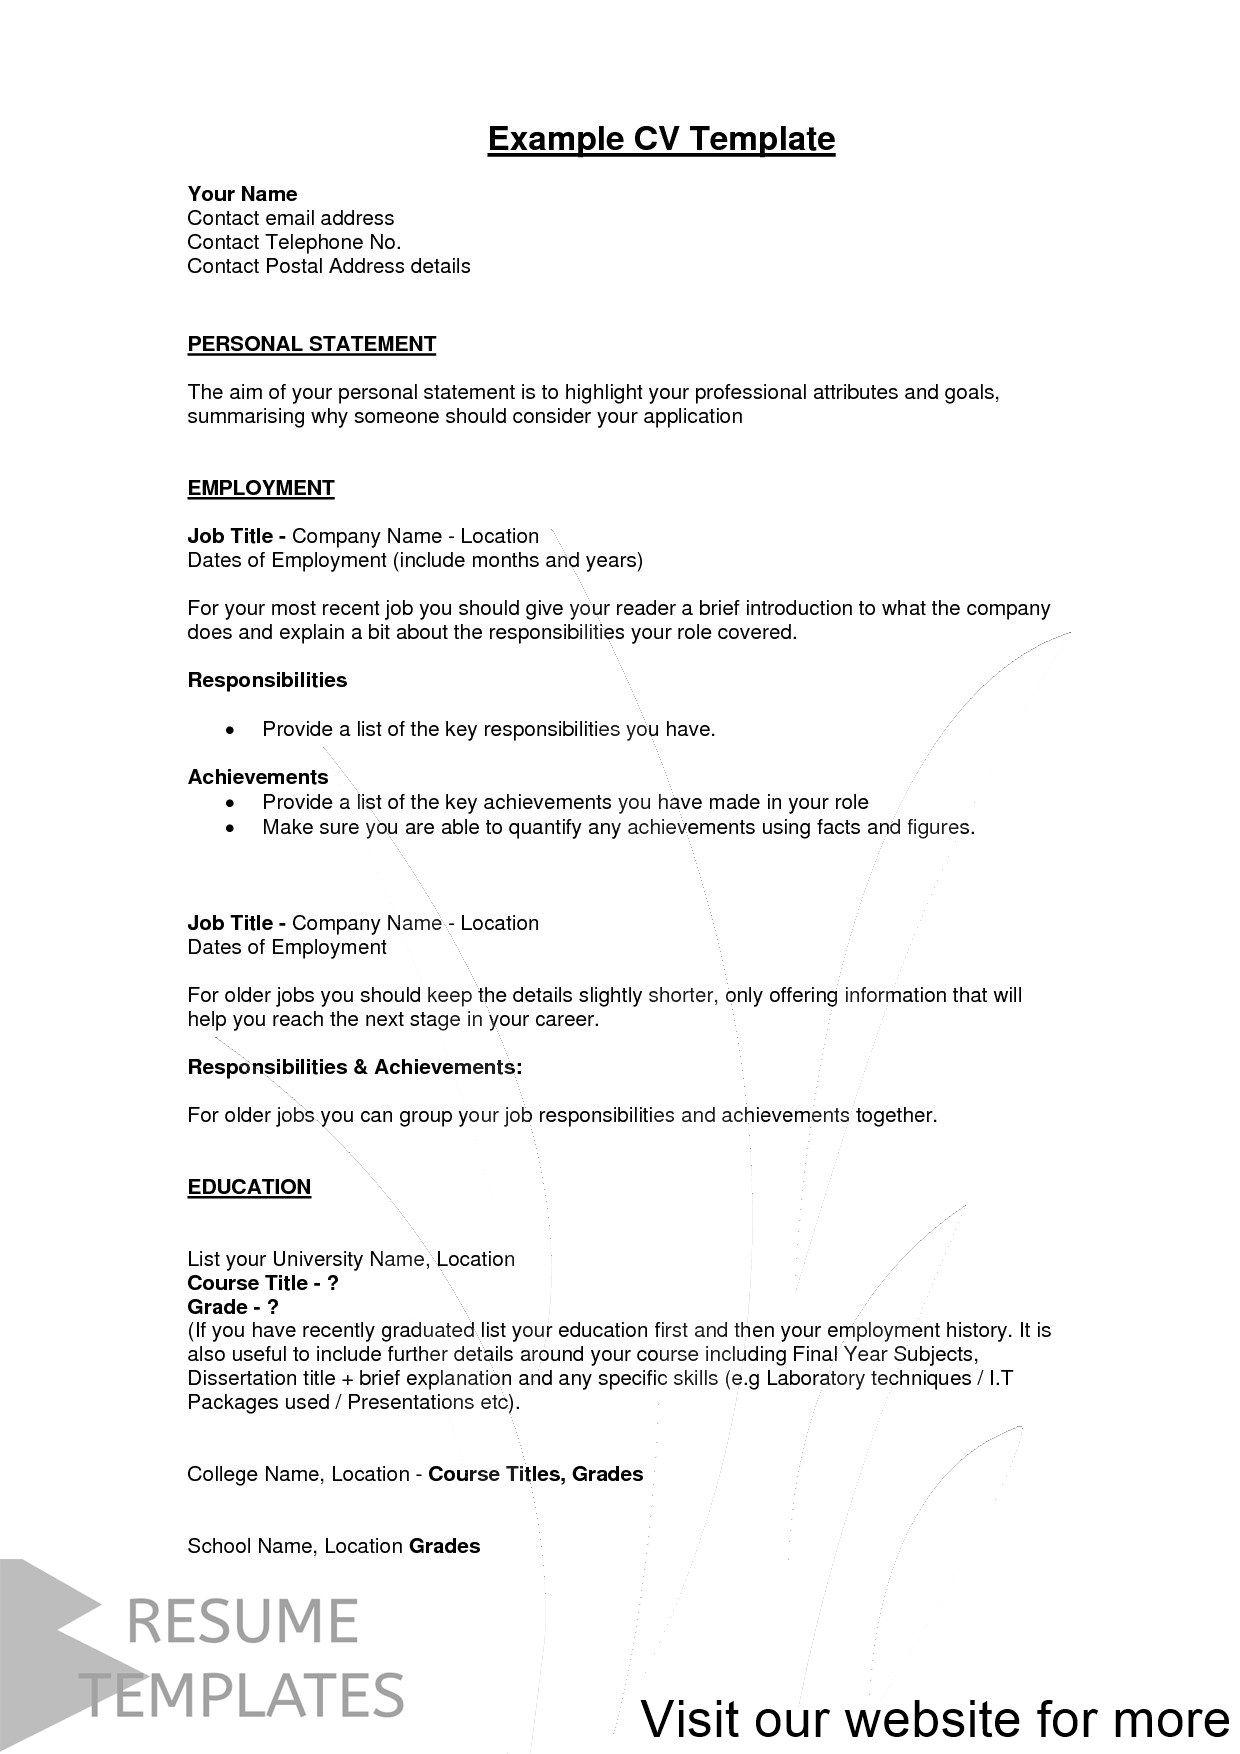 Resume Template Free Resume Template Professional Resume